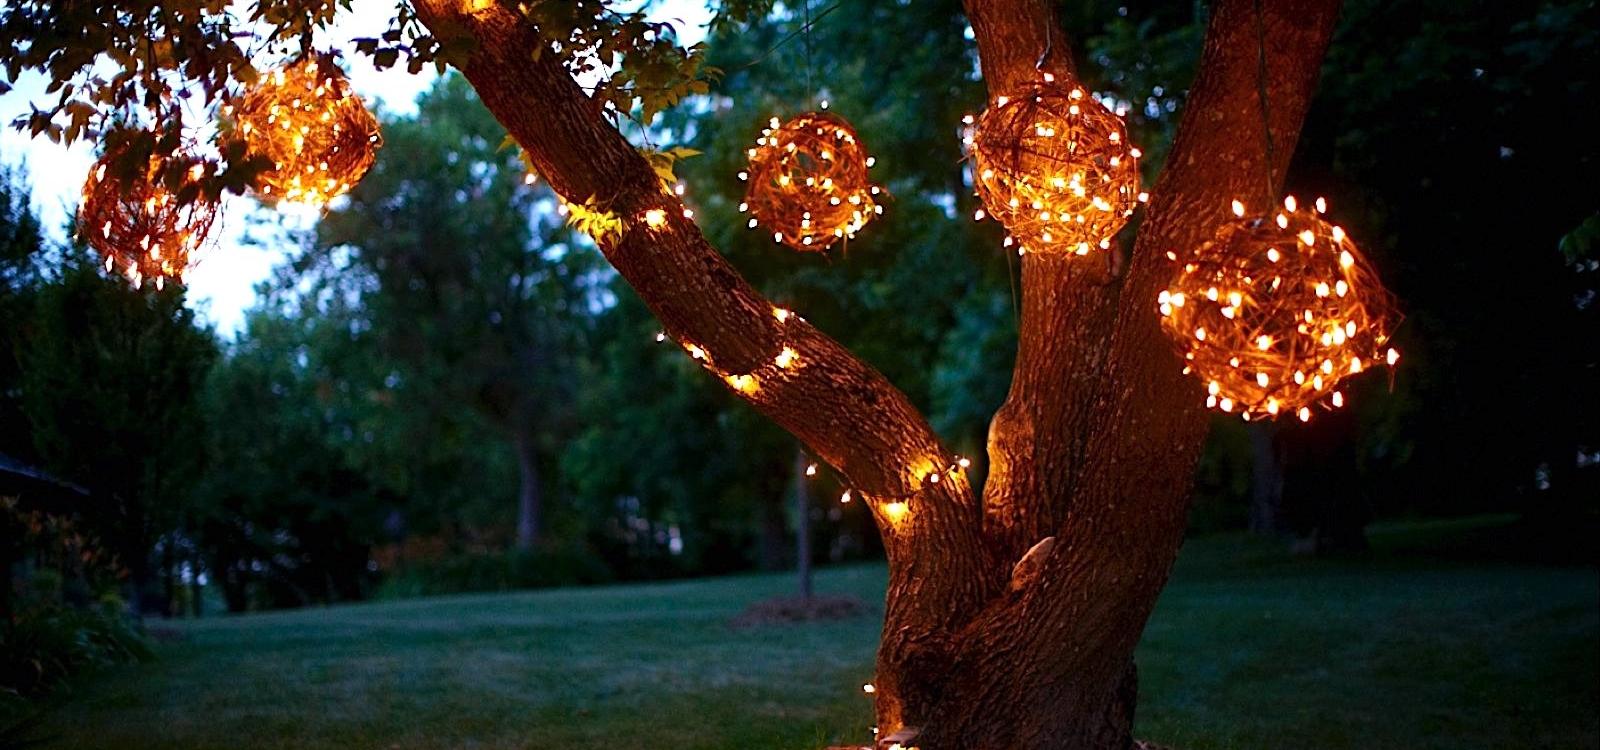 Grapevine Lighting Balls for Your Backyard